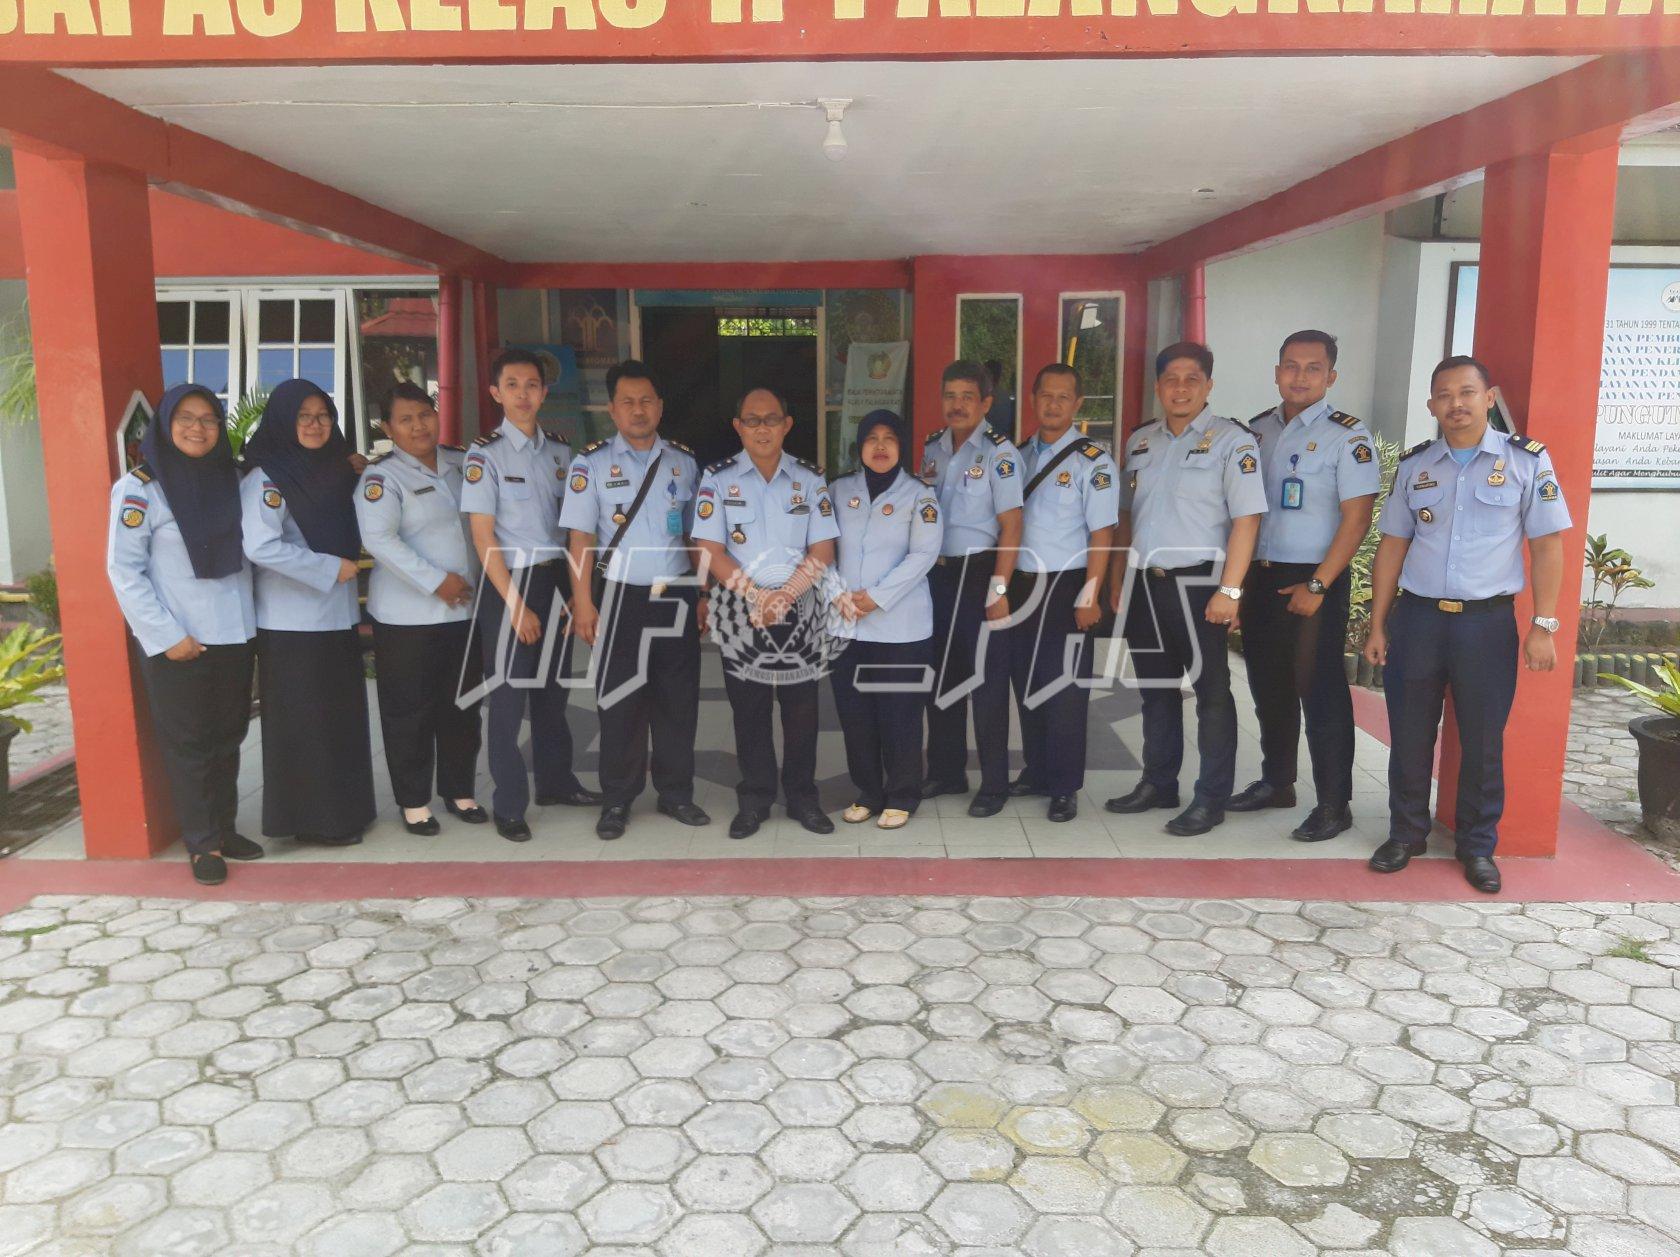 Siap Operasional, Bapas Sampit Studi Tiru ke Bapas Palangka Raya